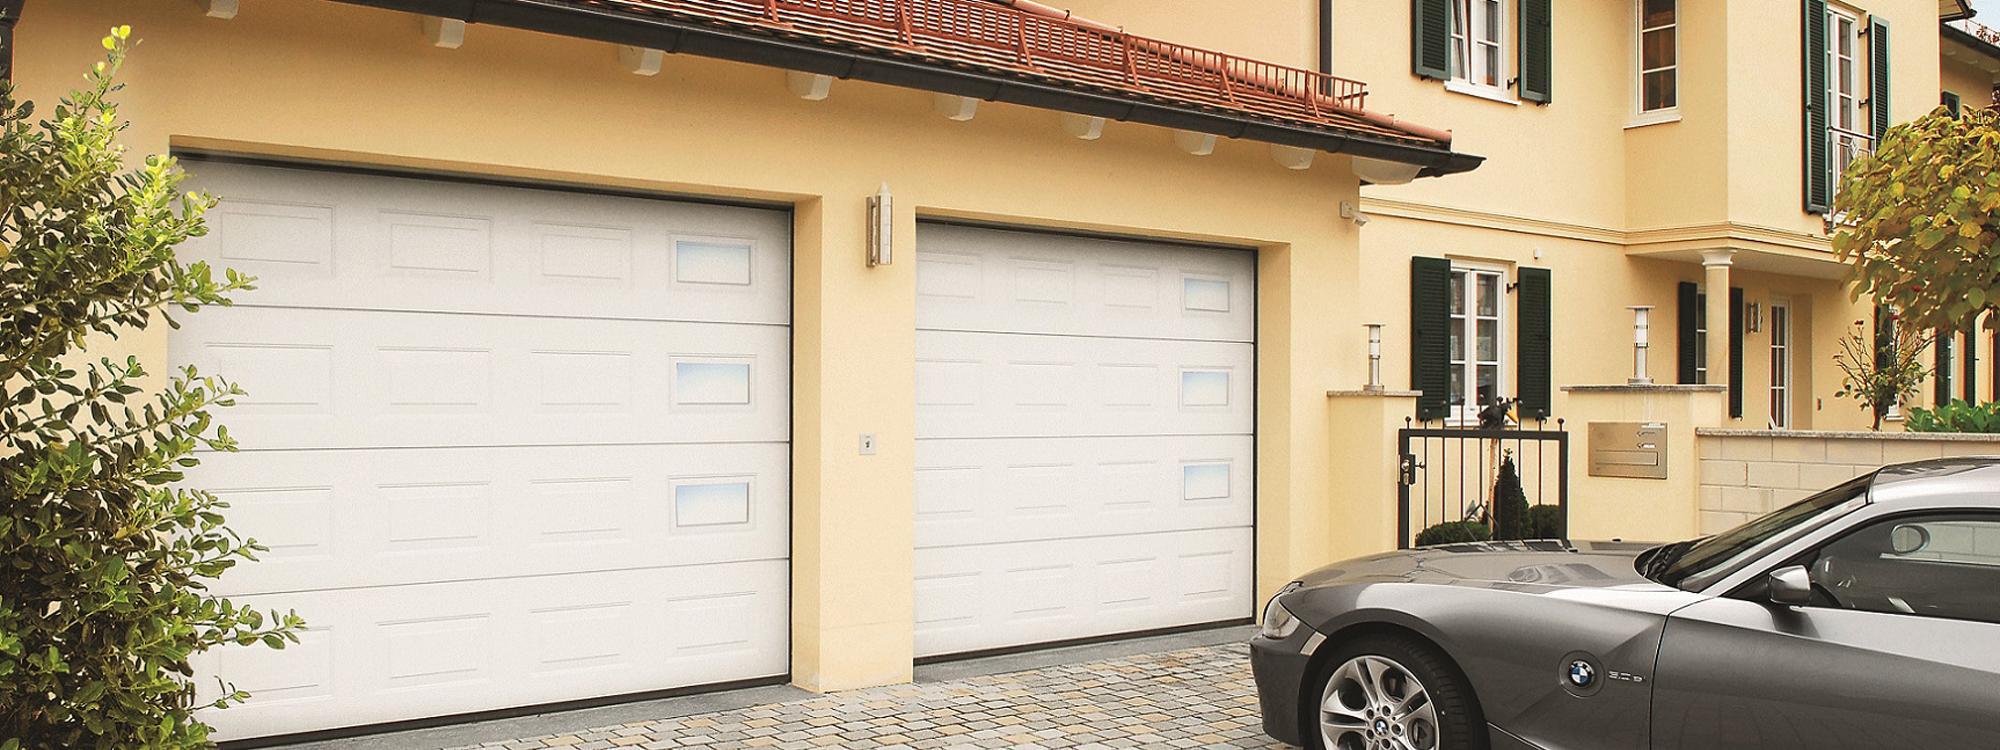 Portes de garage queyras serrurier caen for Garage a caen